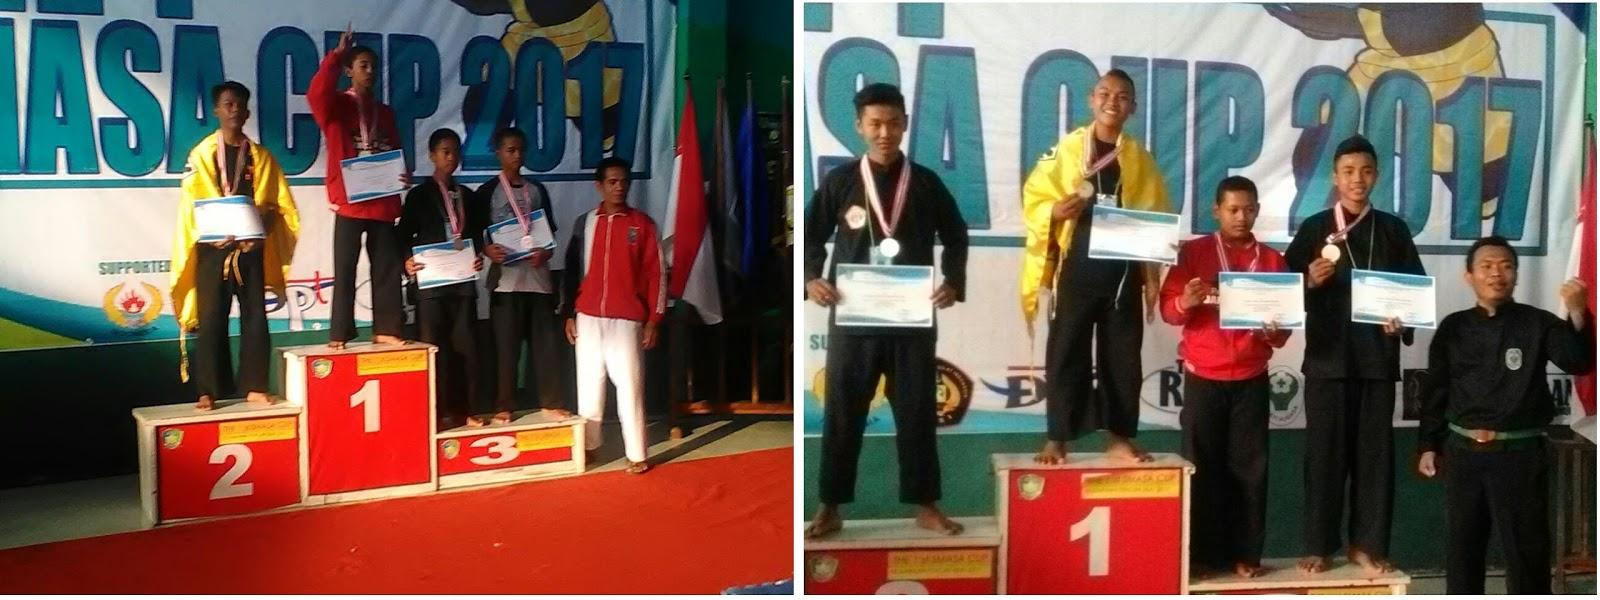 Khoirudin Mustakim, Mahasiswa UNS Juara Pencak Silat Dunia